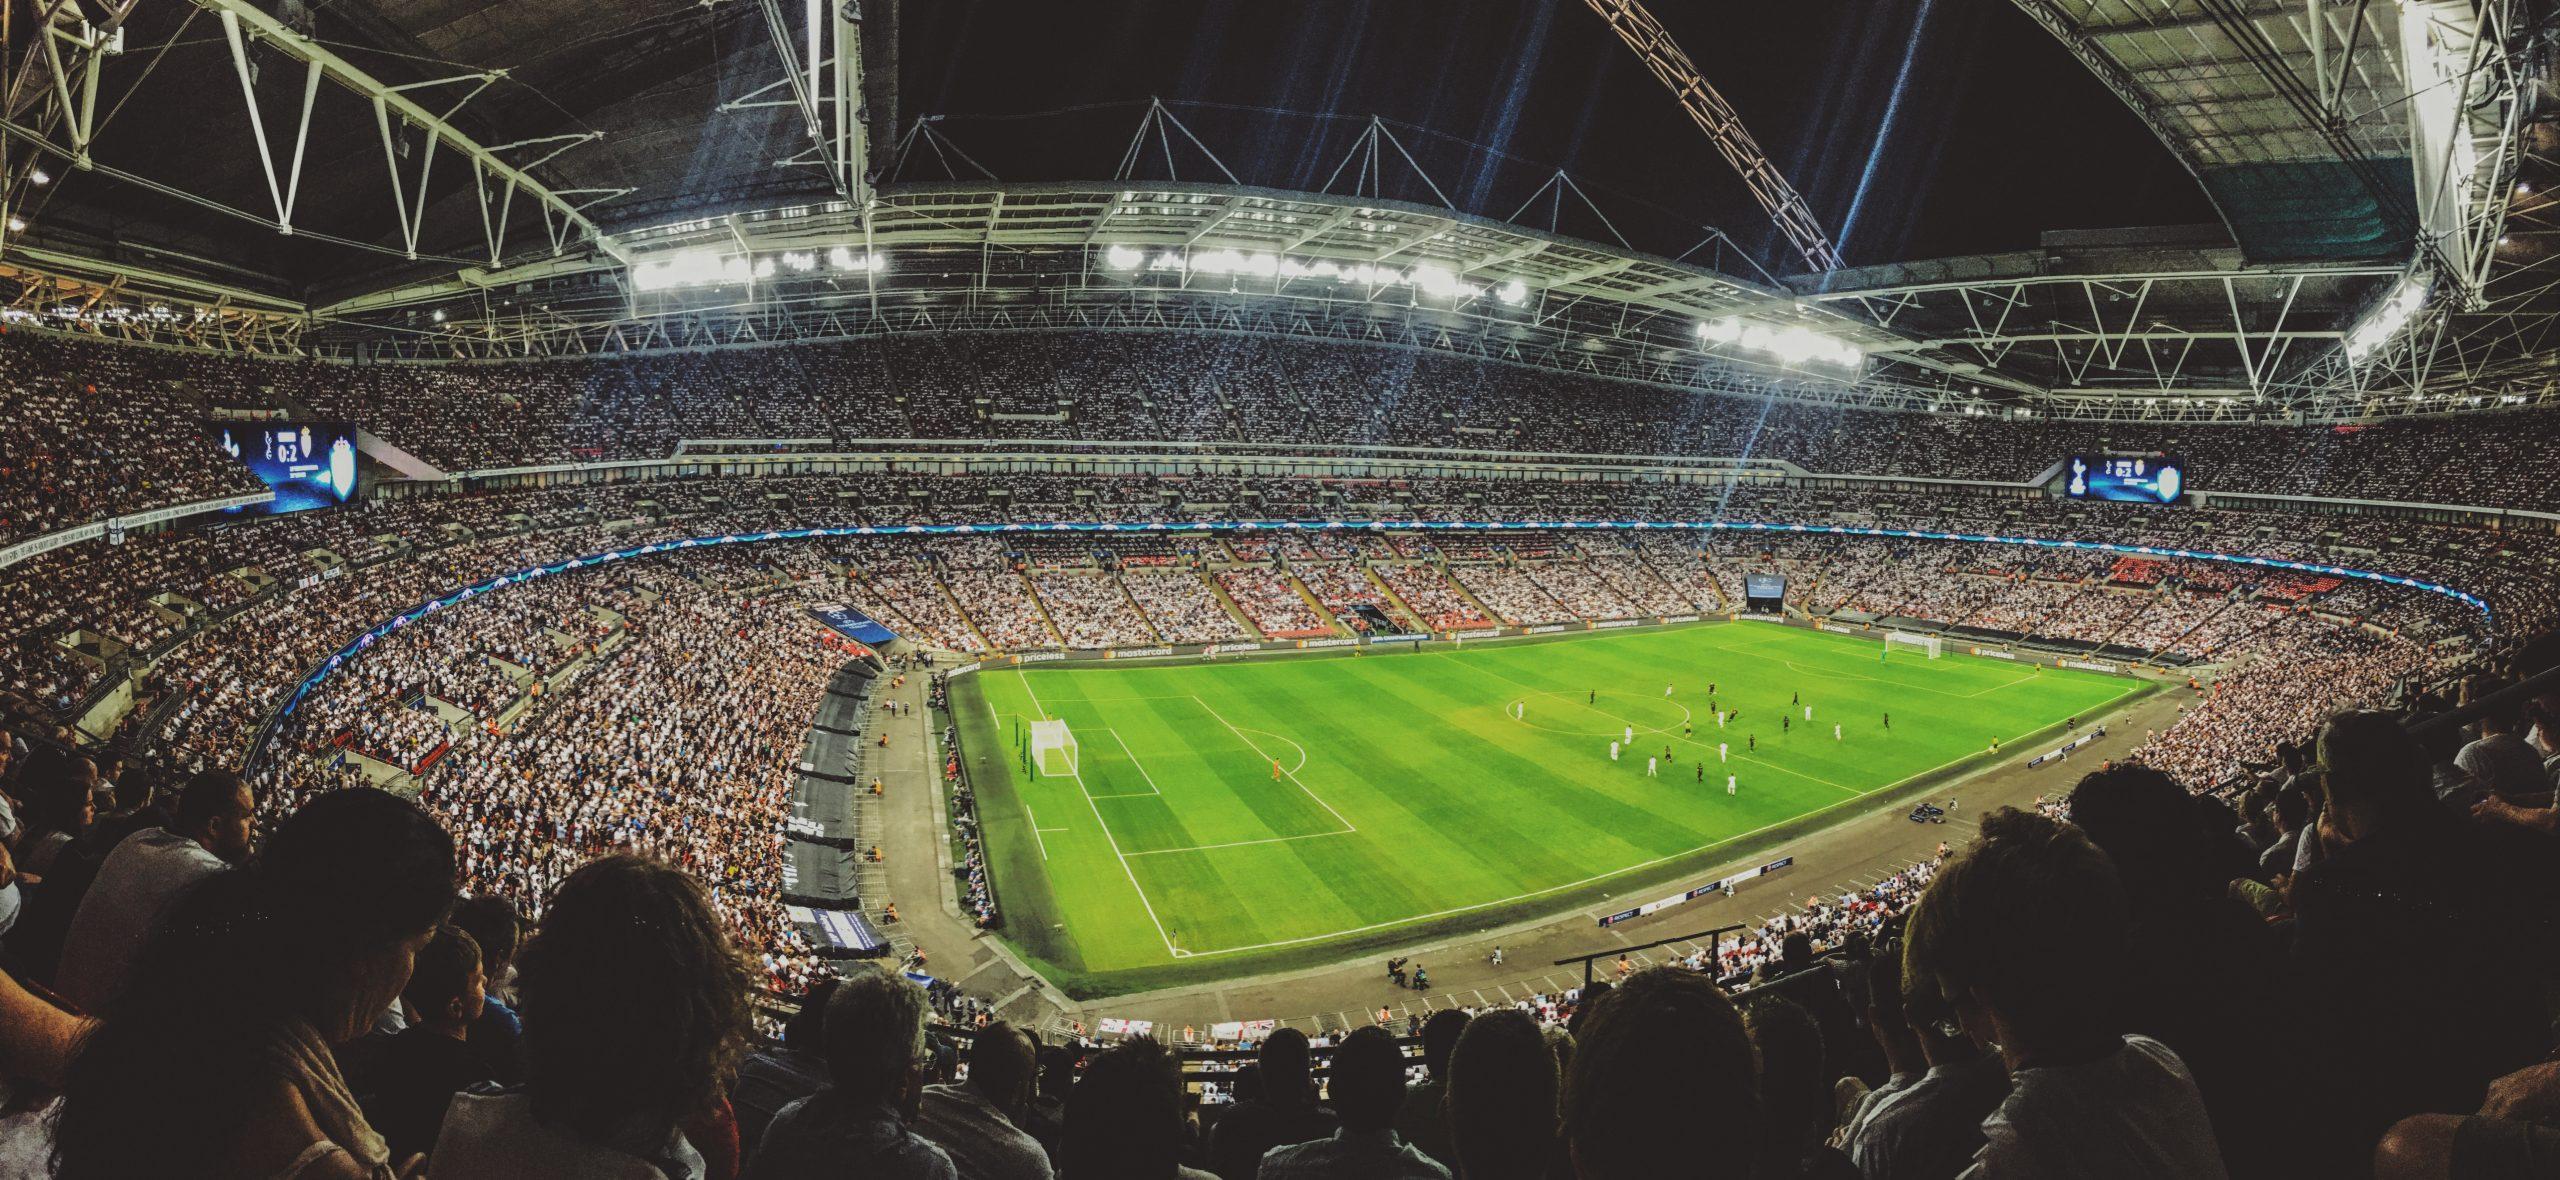 Wembley EURO 2020 Final Location